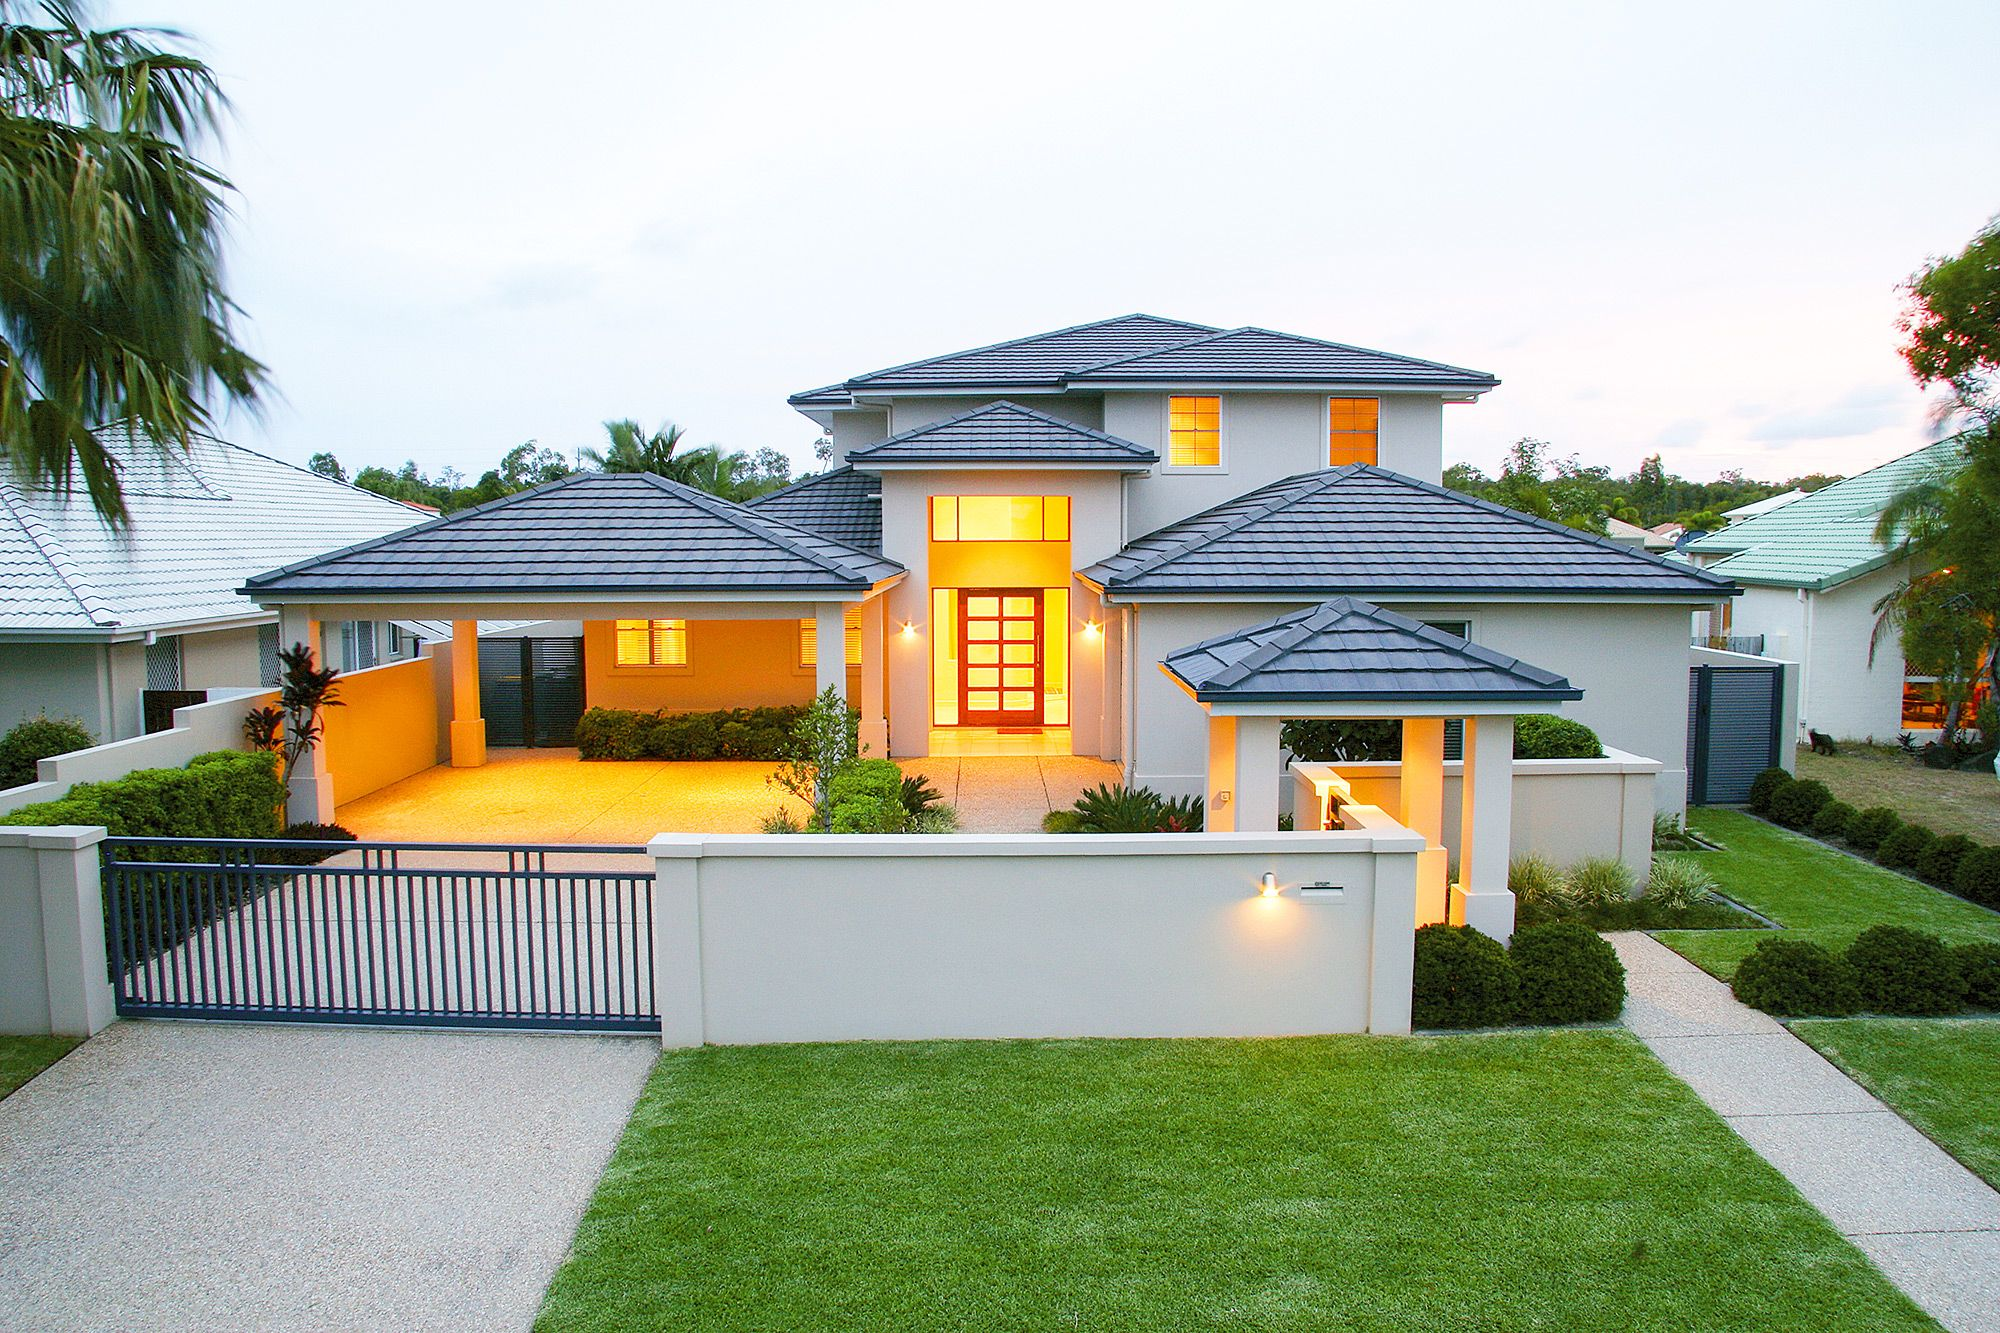 Check Out This Tile From Monier Atura Traditonal In Barramundi Concrete Tiles Australian Homes Concrete Roof Tiles